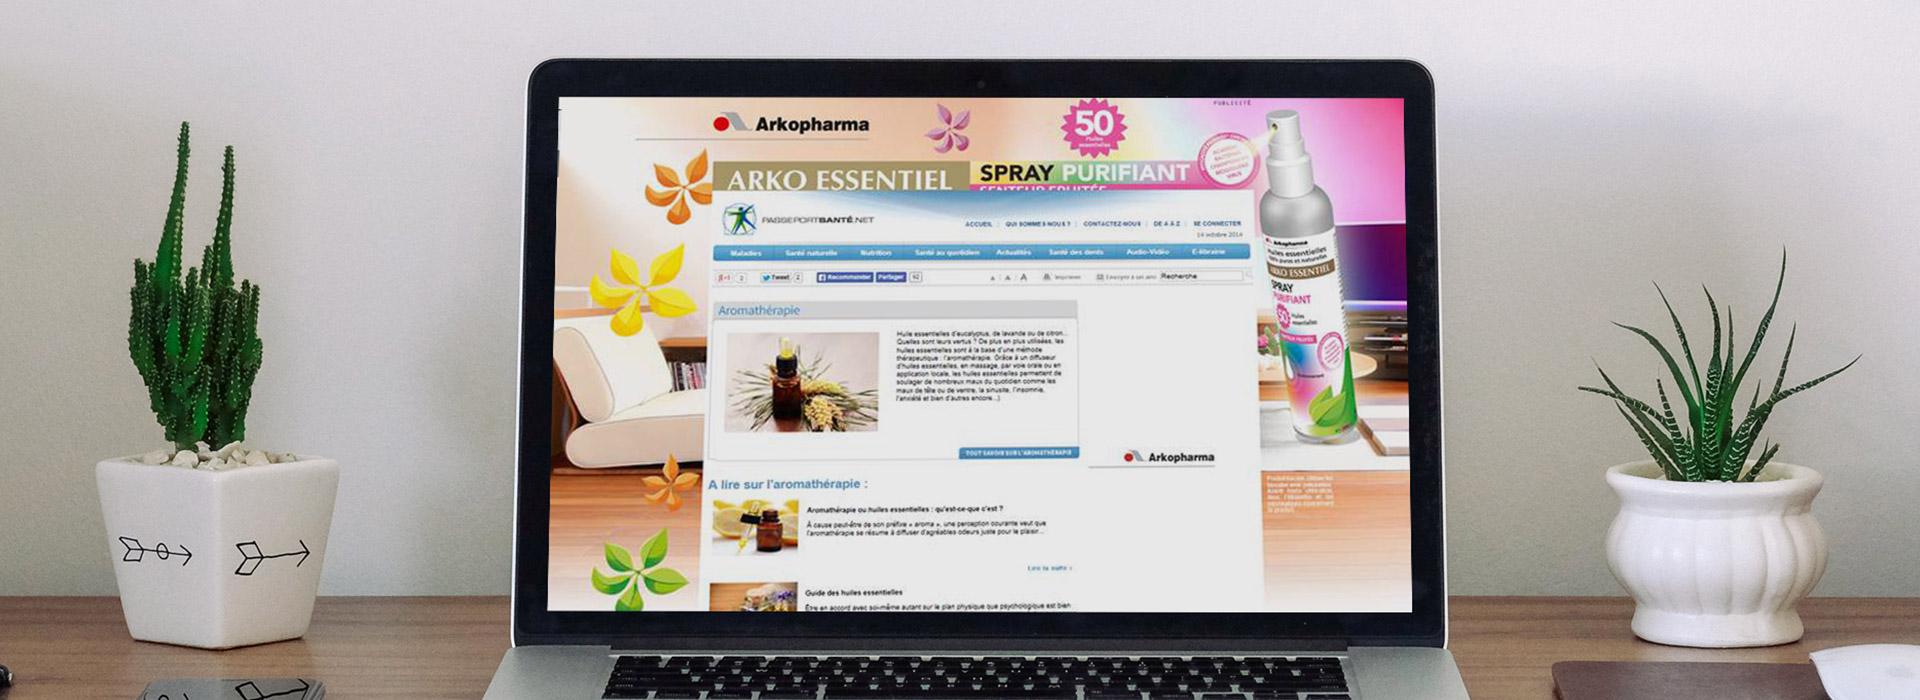 http://adsolue-banniere-web-arkopharma-paysage-web